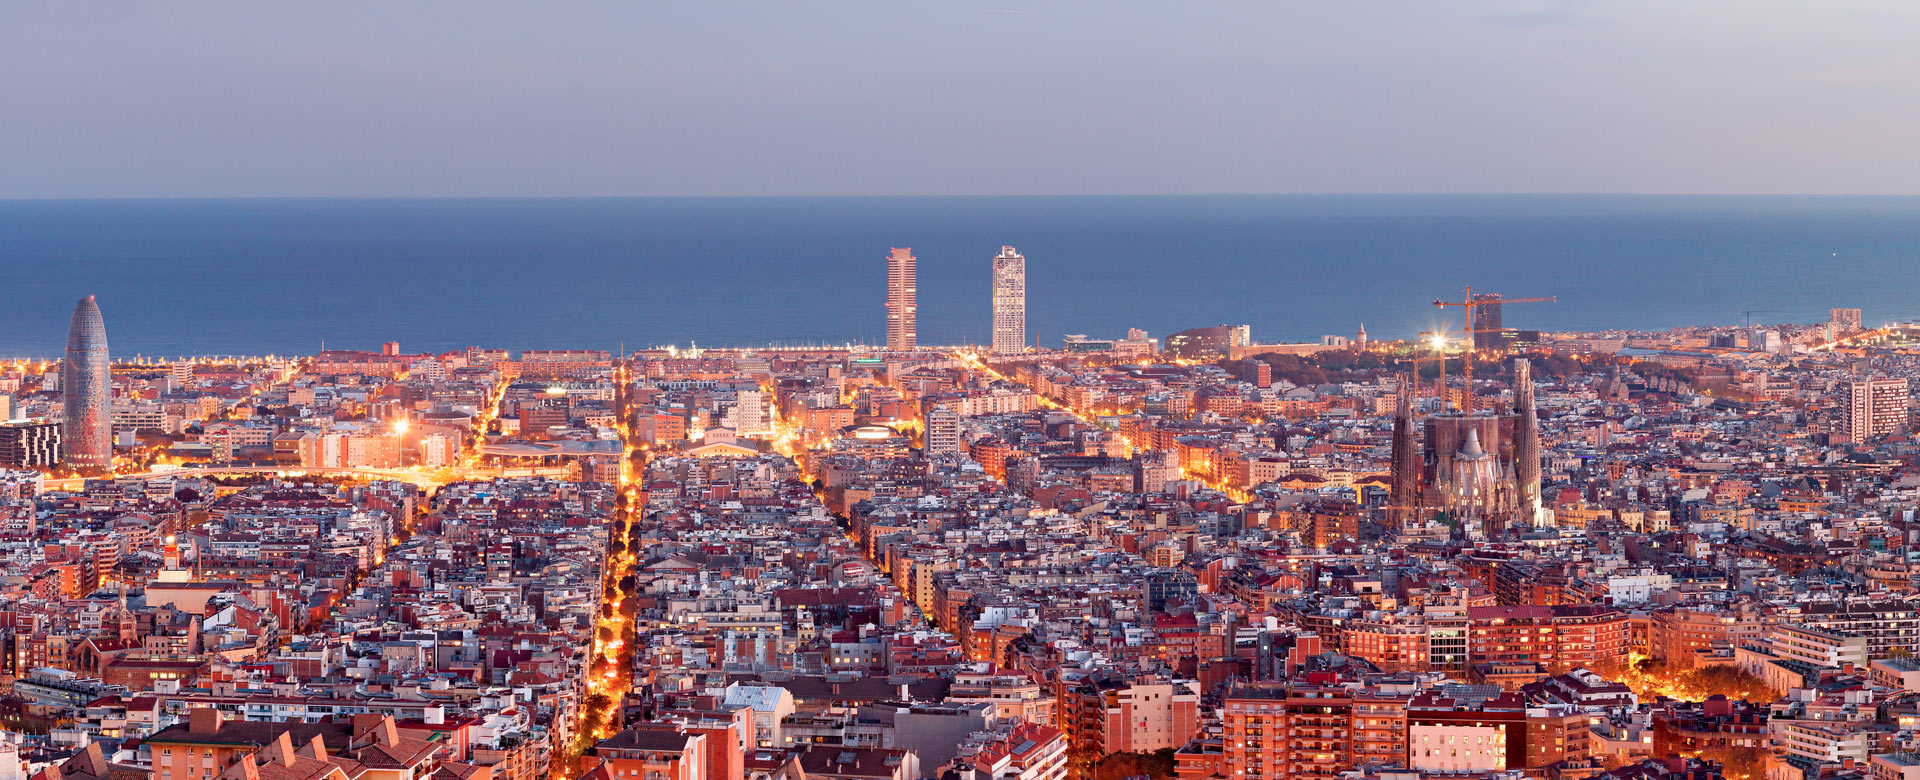 Alquiler de villas en Barcelona